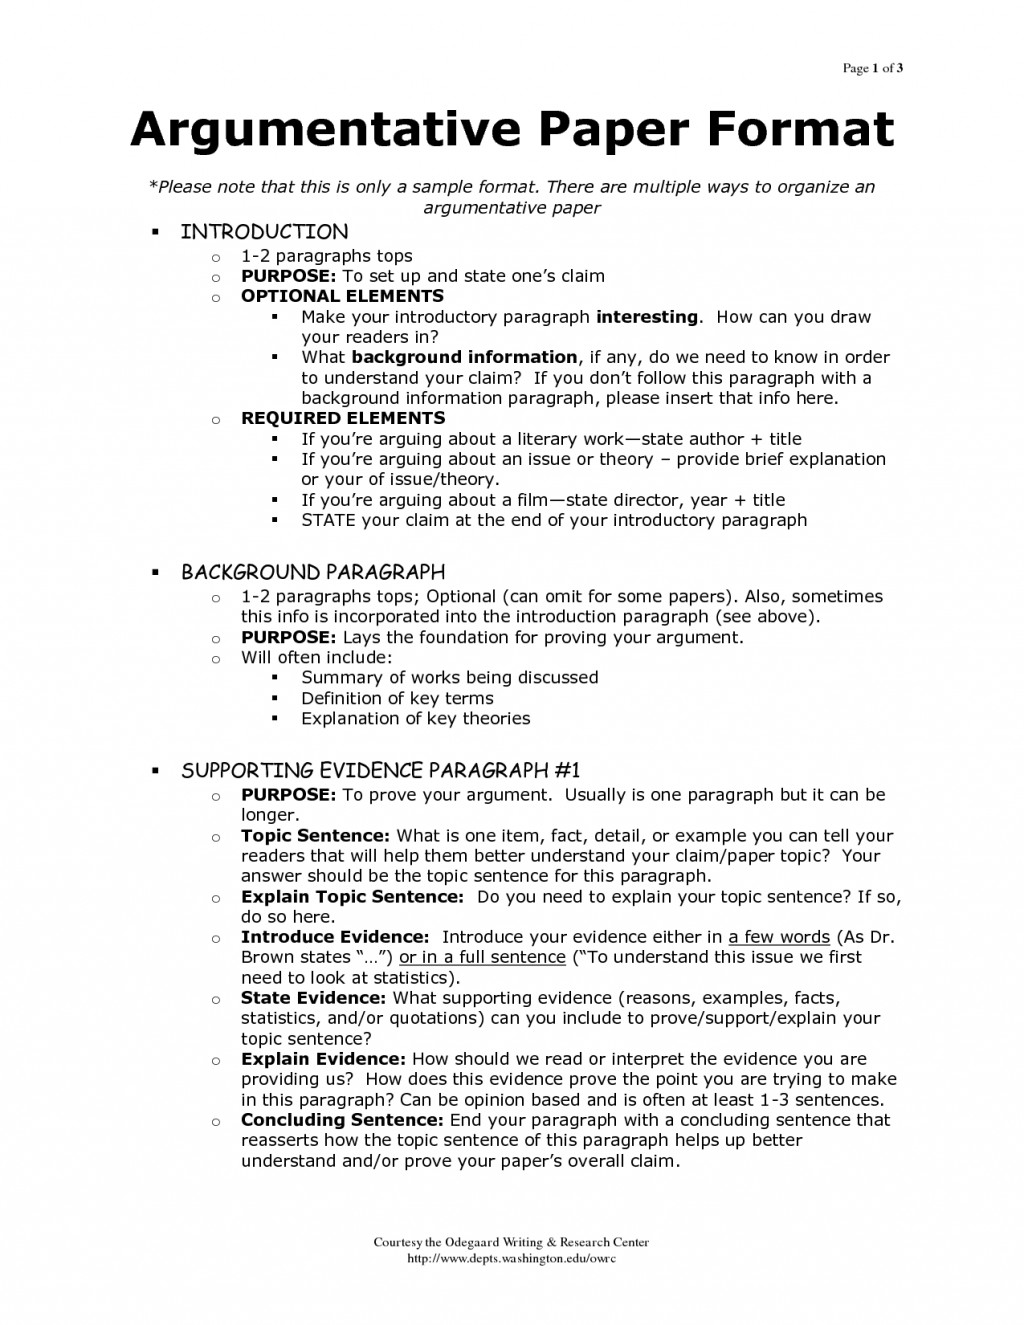 003 Nj9s0dardu Argumentative Research Essay Phenomenal Example Structure Medical Topics Large